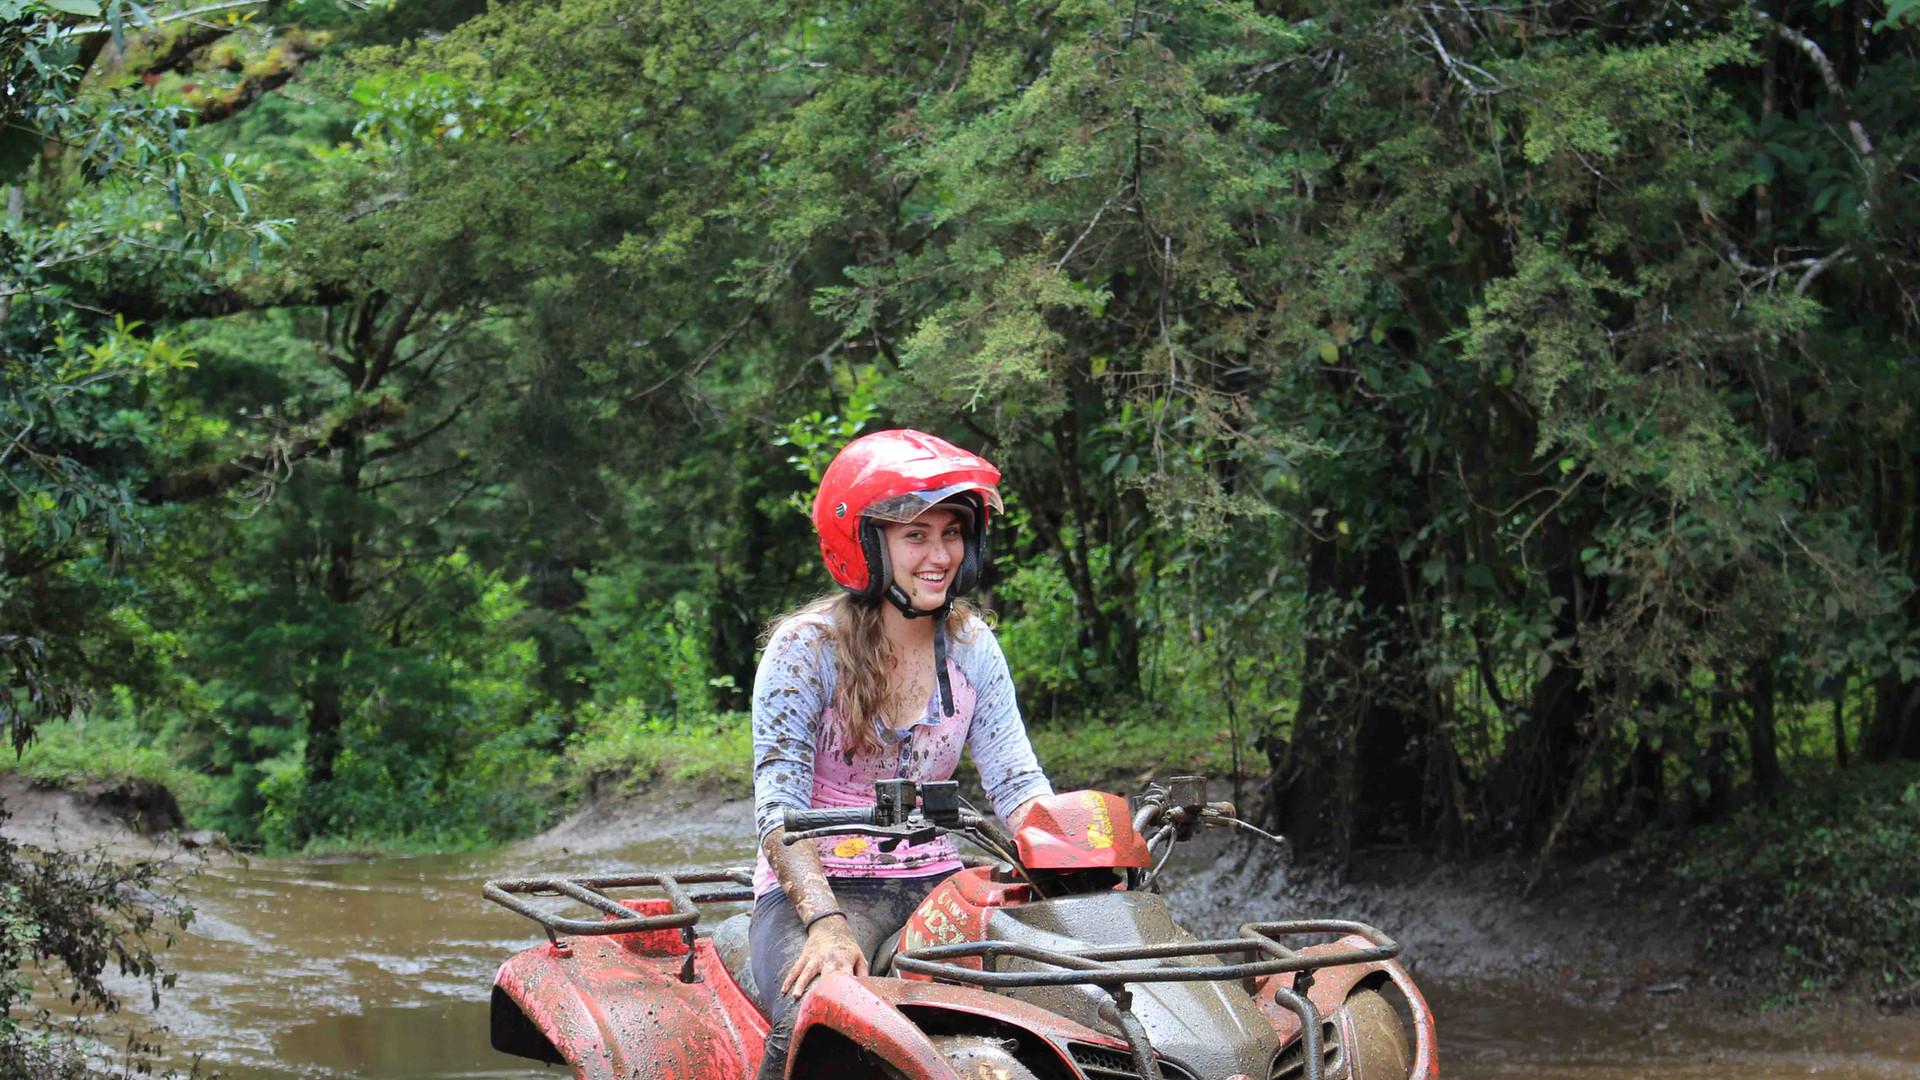 Monteverde Costa Rica ATV adventure tour woman with red helmet crossing traversing river smiling